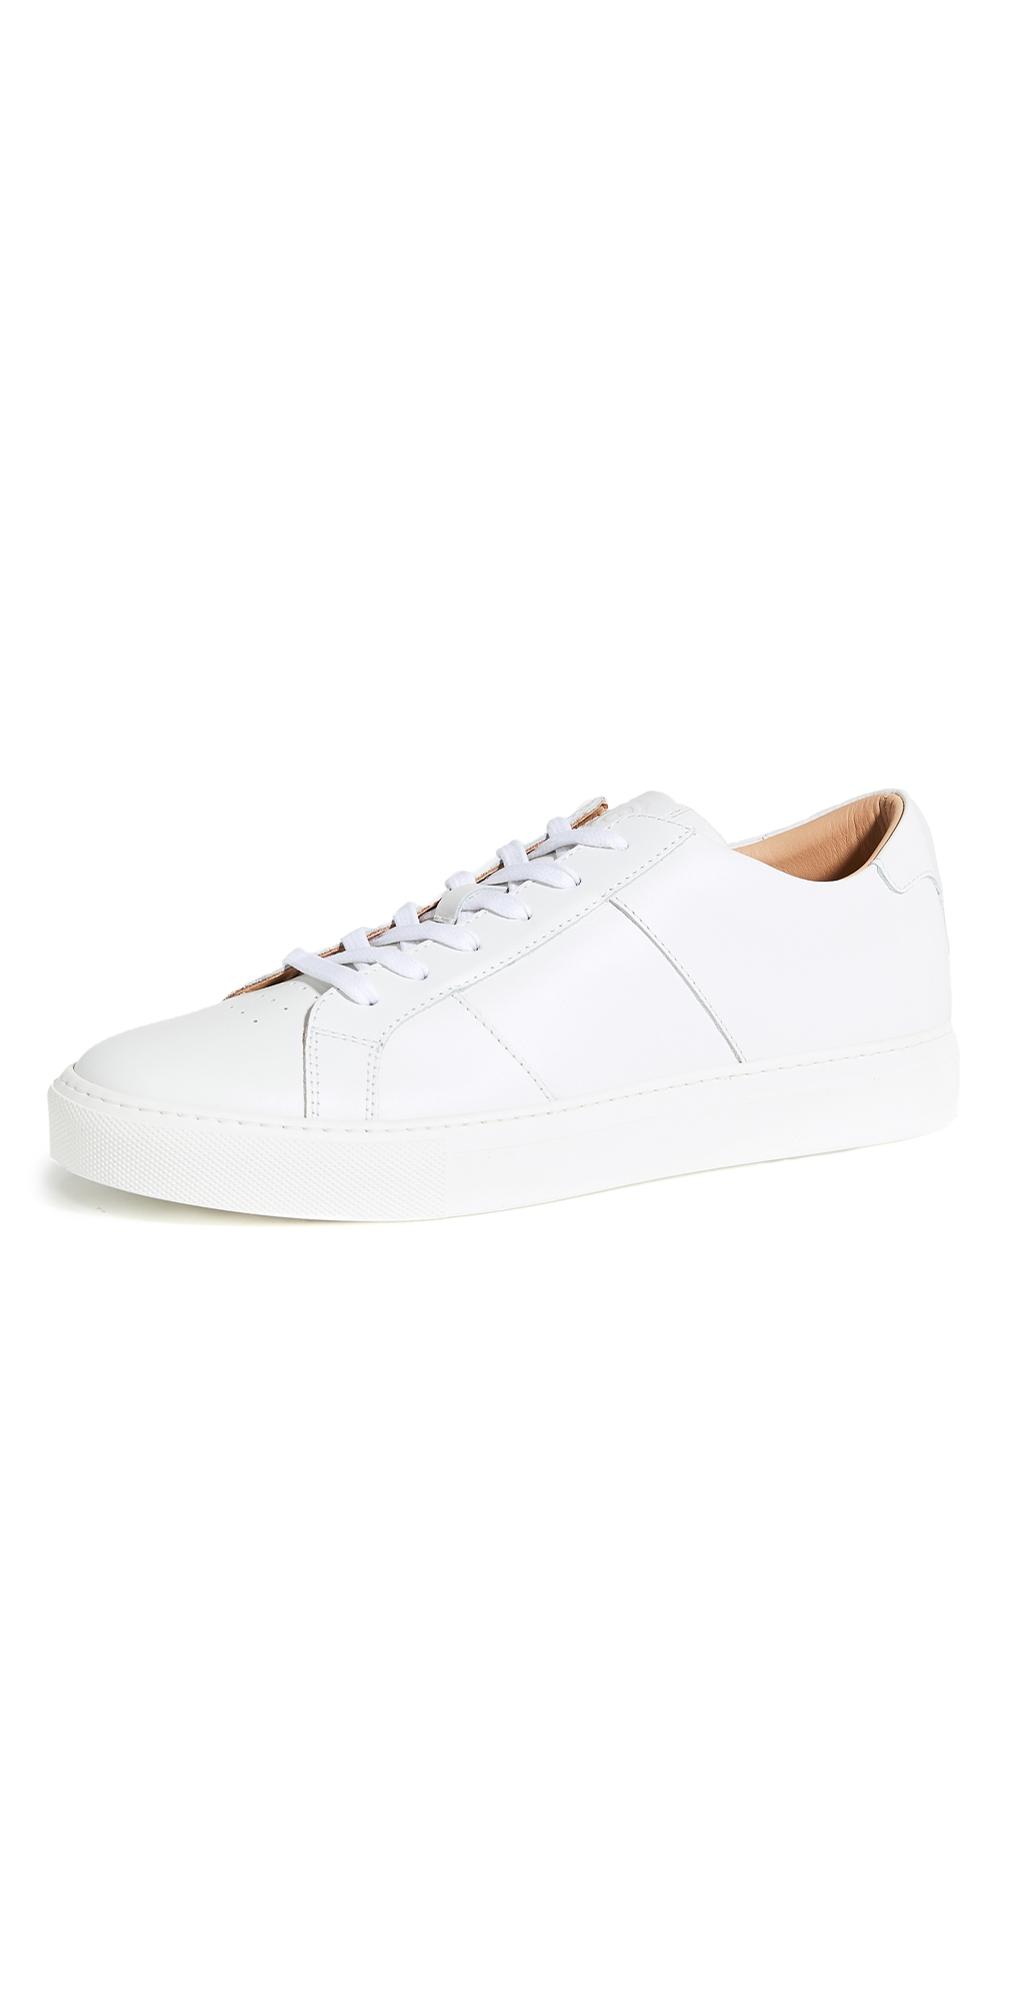 Royale Sneakers